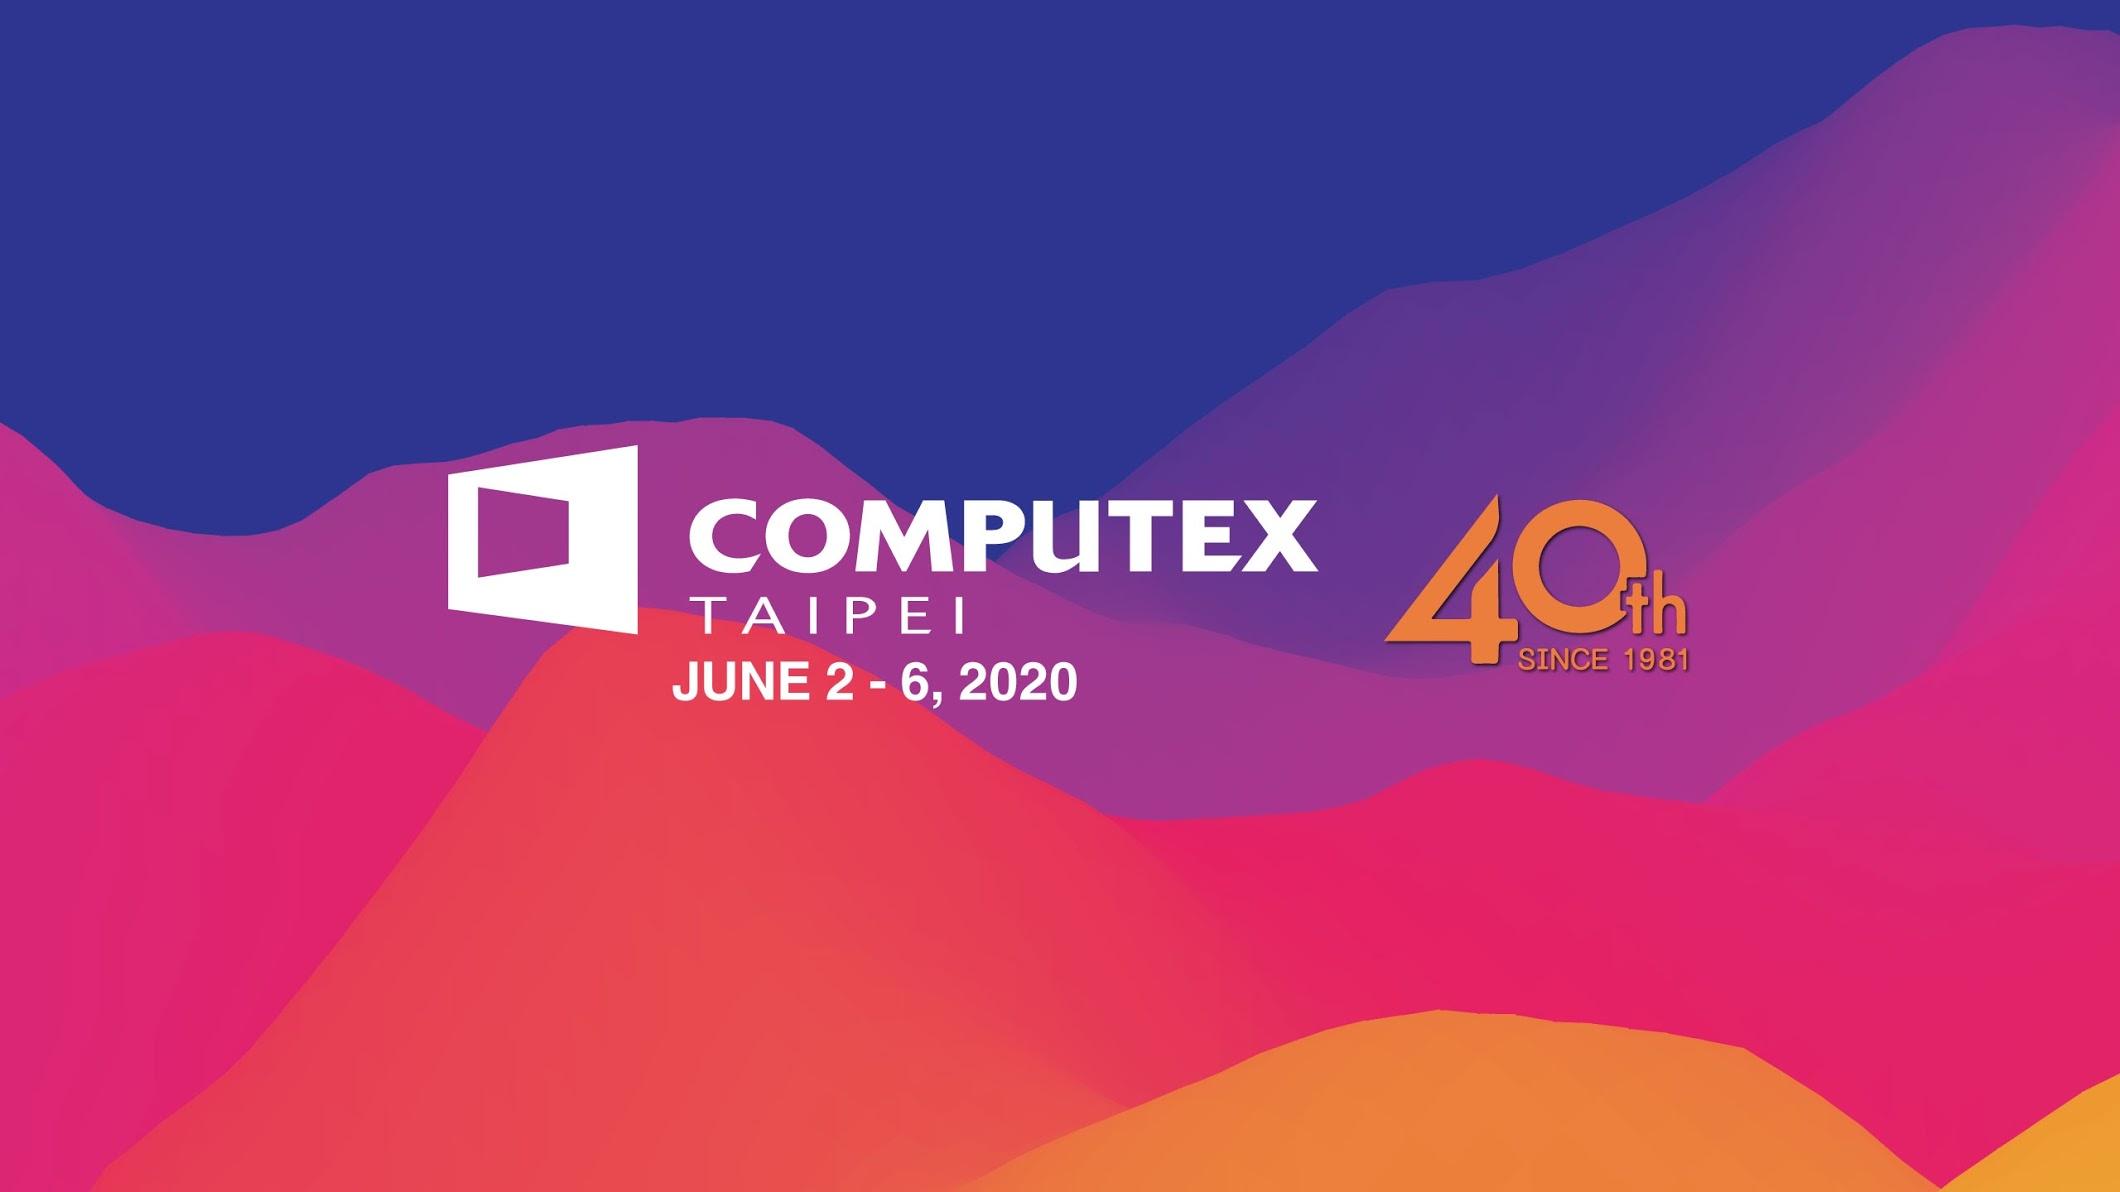 COVID-19 COMPUTEX 2020 COVID-19 فيروس كورونا